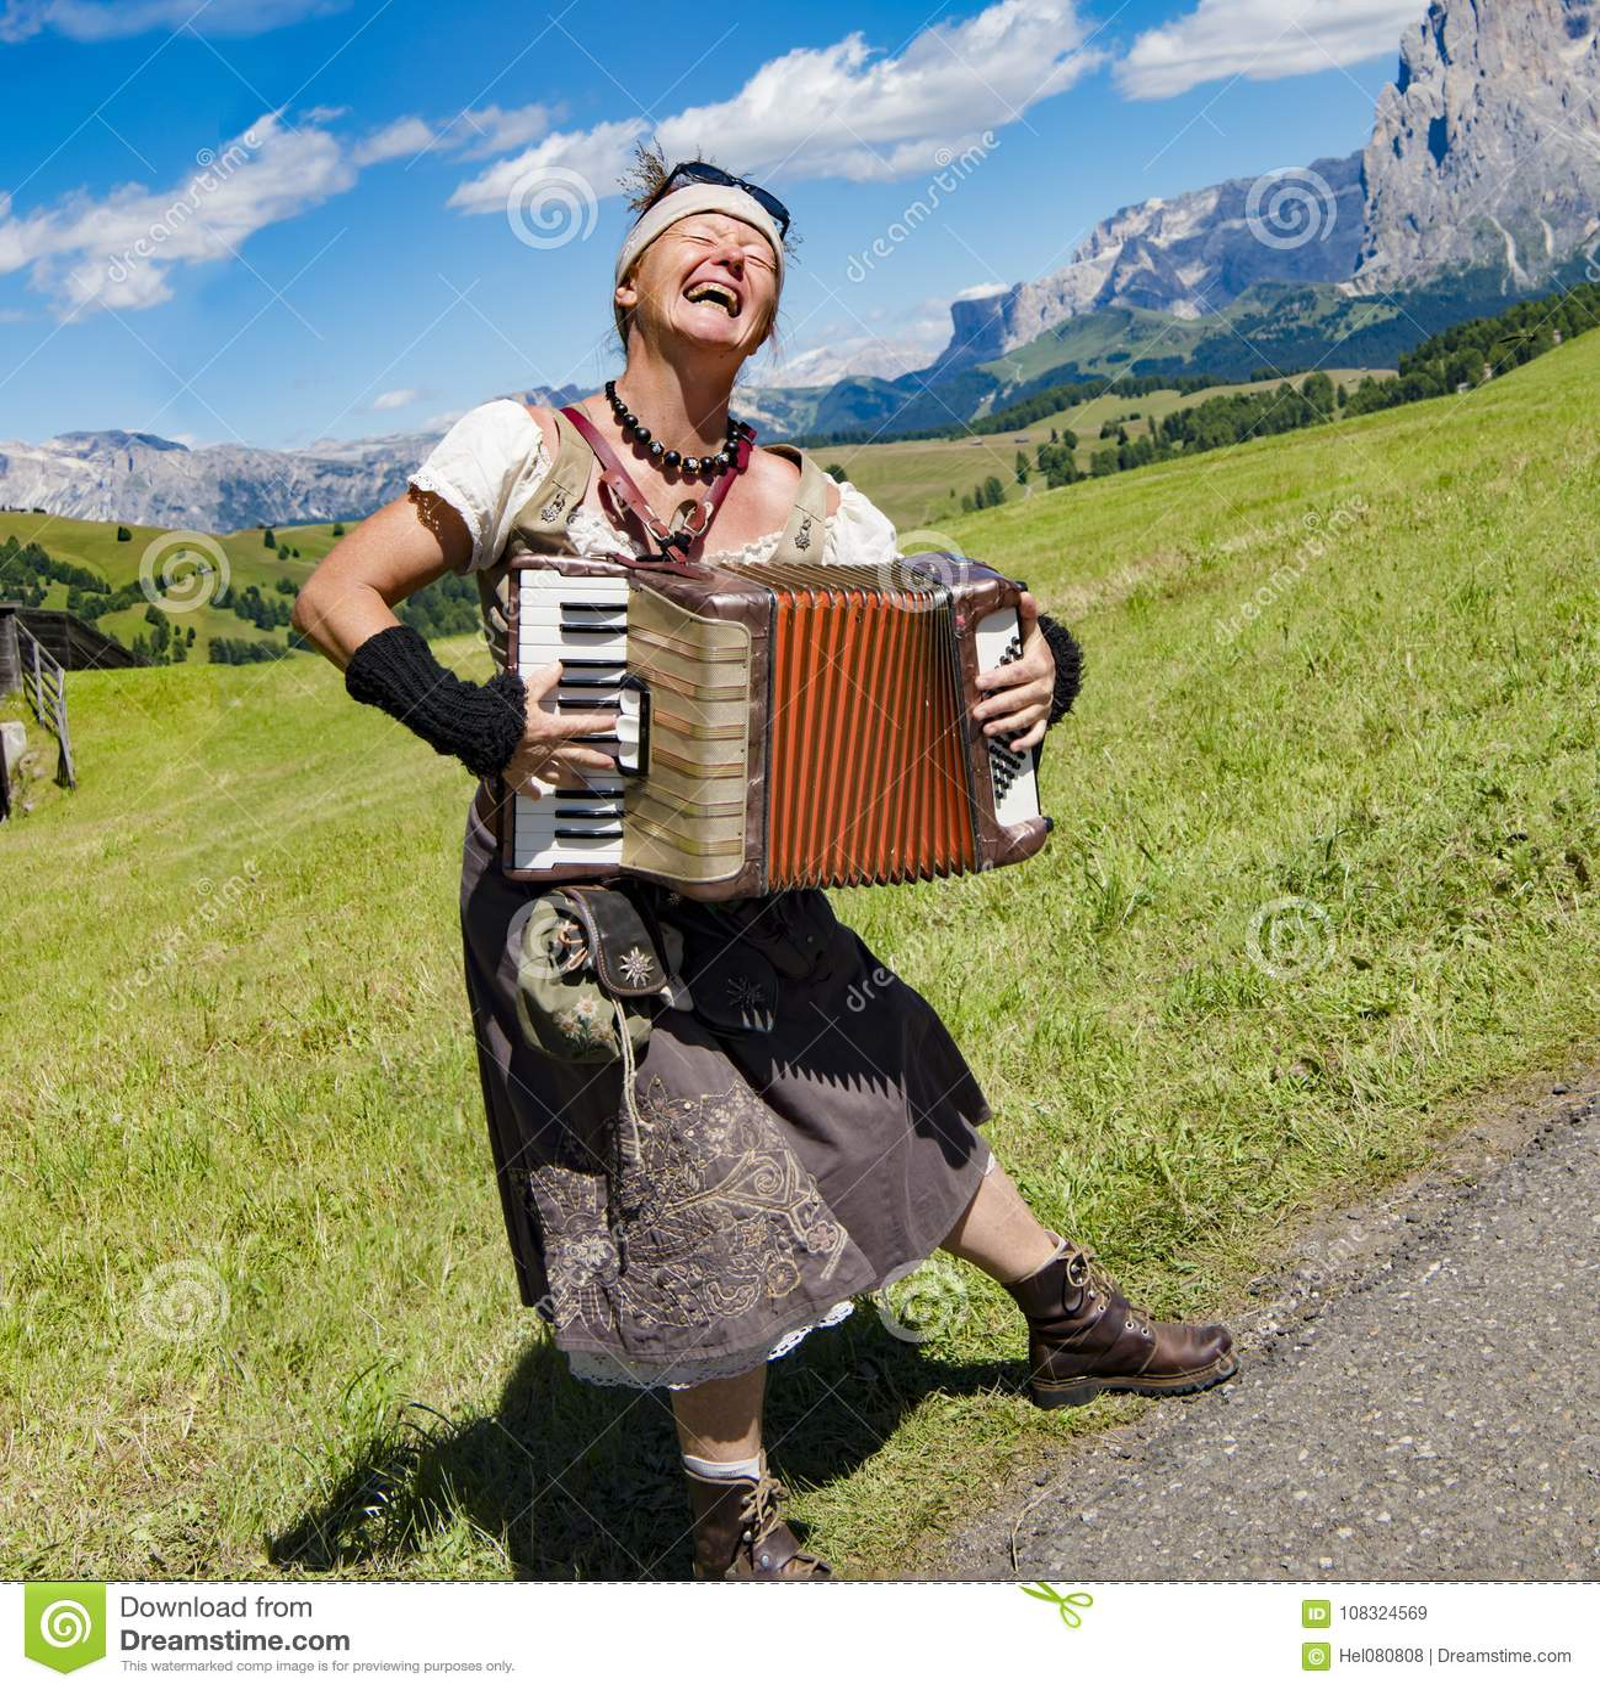 Music cartoon 1820*1454 transprent png free download wood, tyrol.